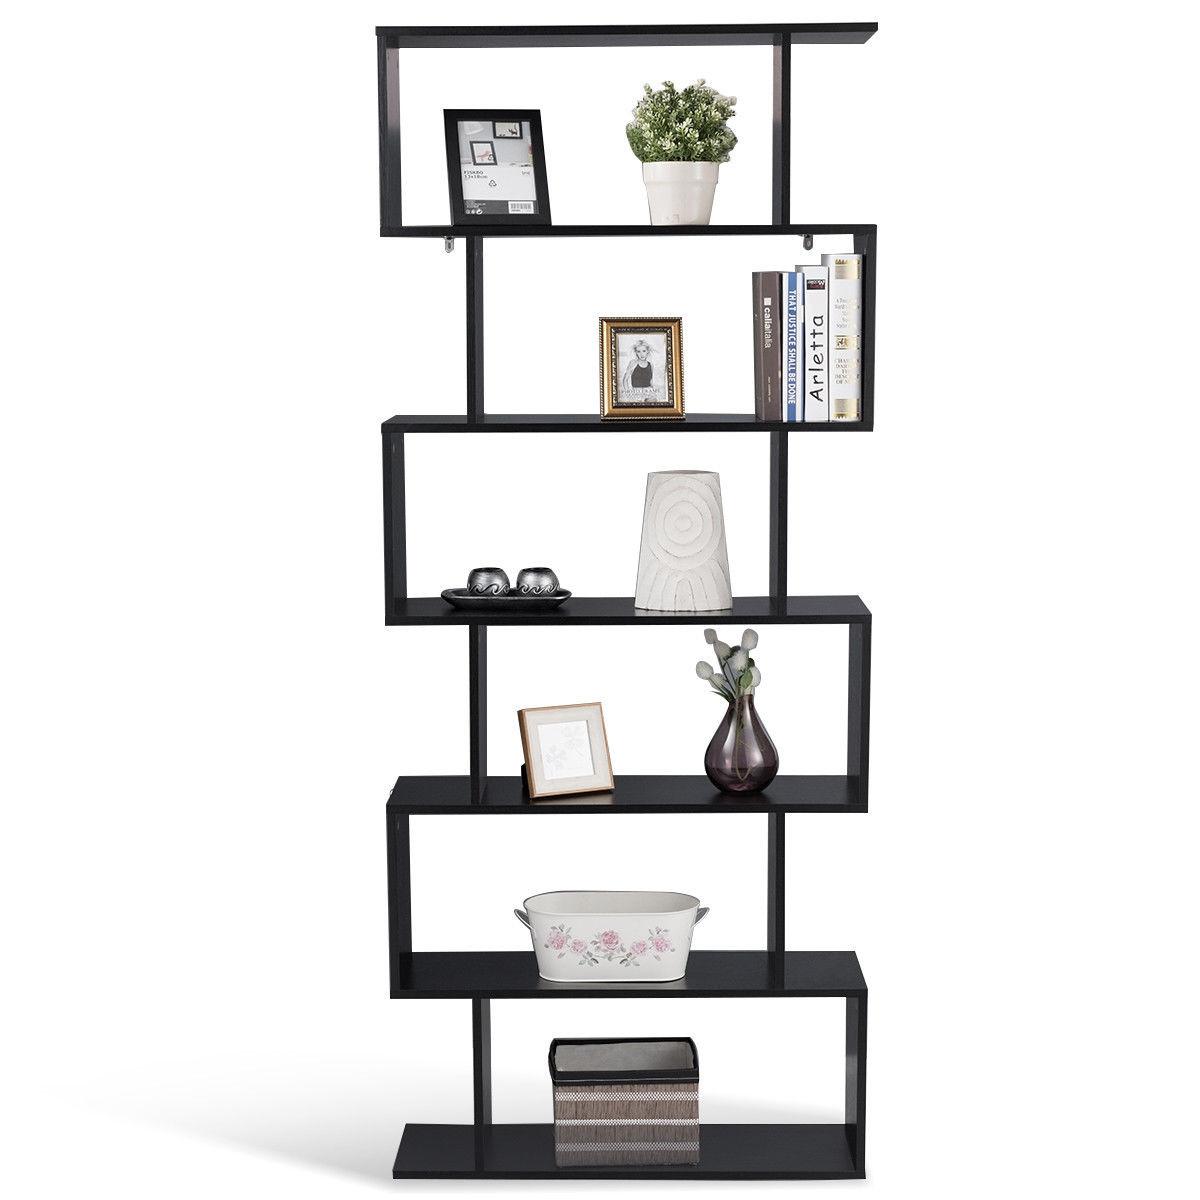 6-Tier S-Shaped Bookcase Z-Shelf Style Storage Bookshelf - $65.95 + Free Shipping